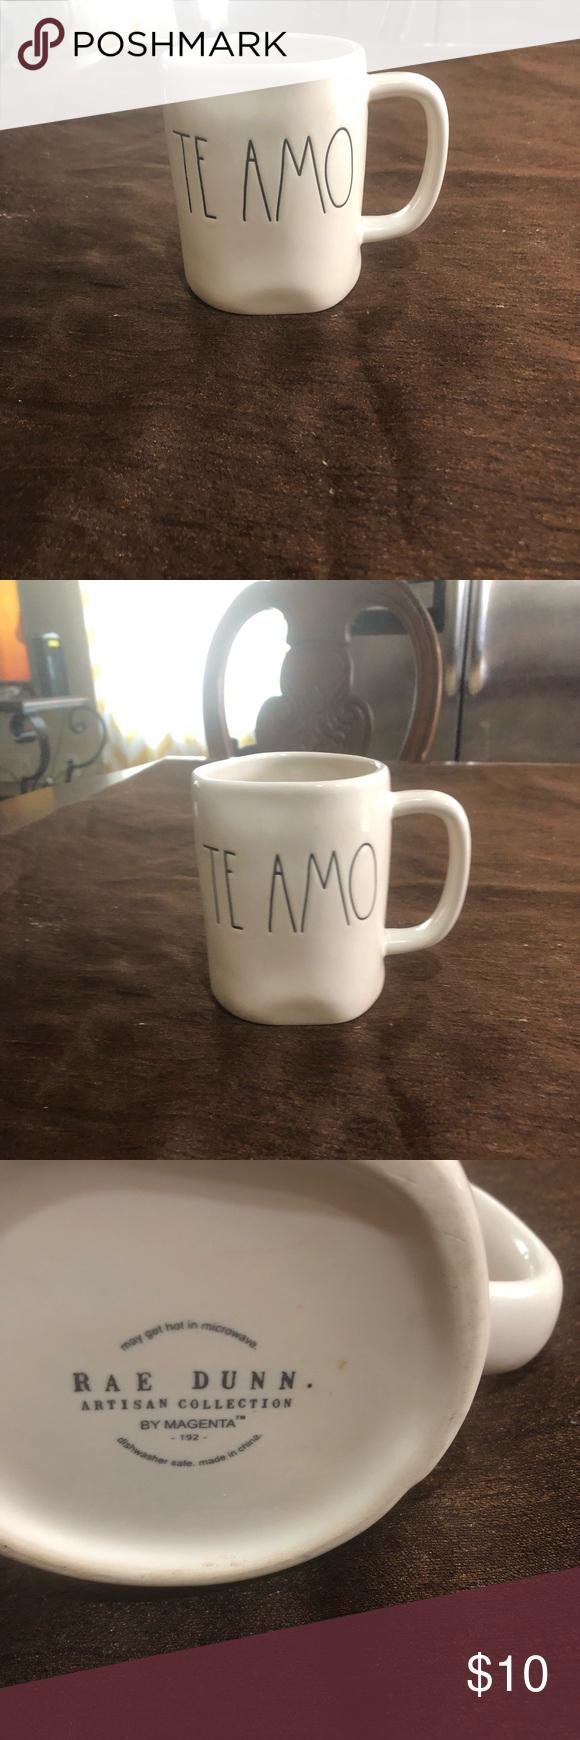 Rae Dunn Coffee Cup Coffee Cups Coffee And Tea Accessories Dunn